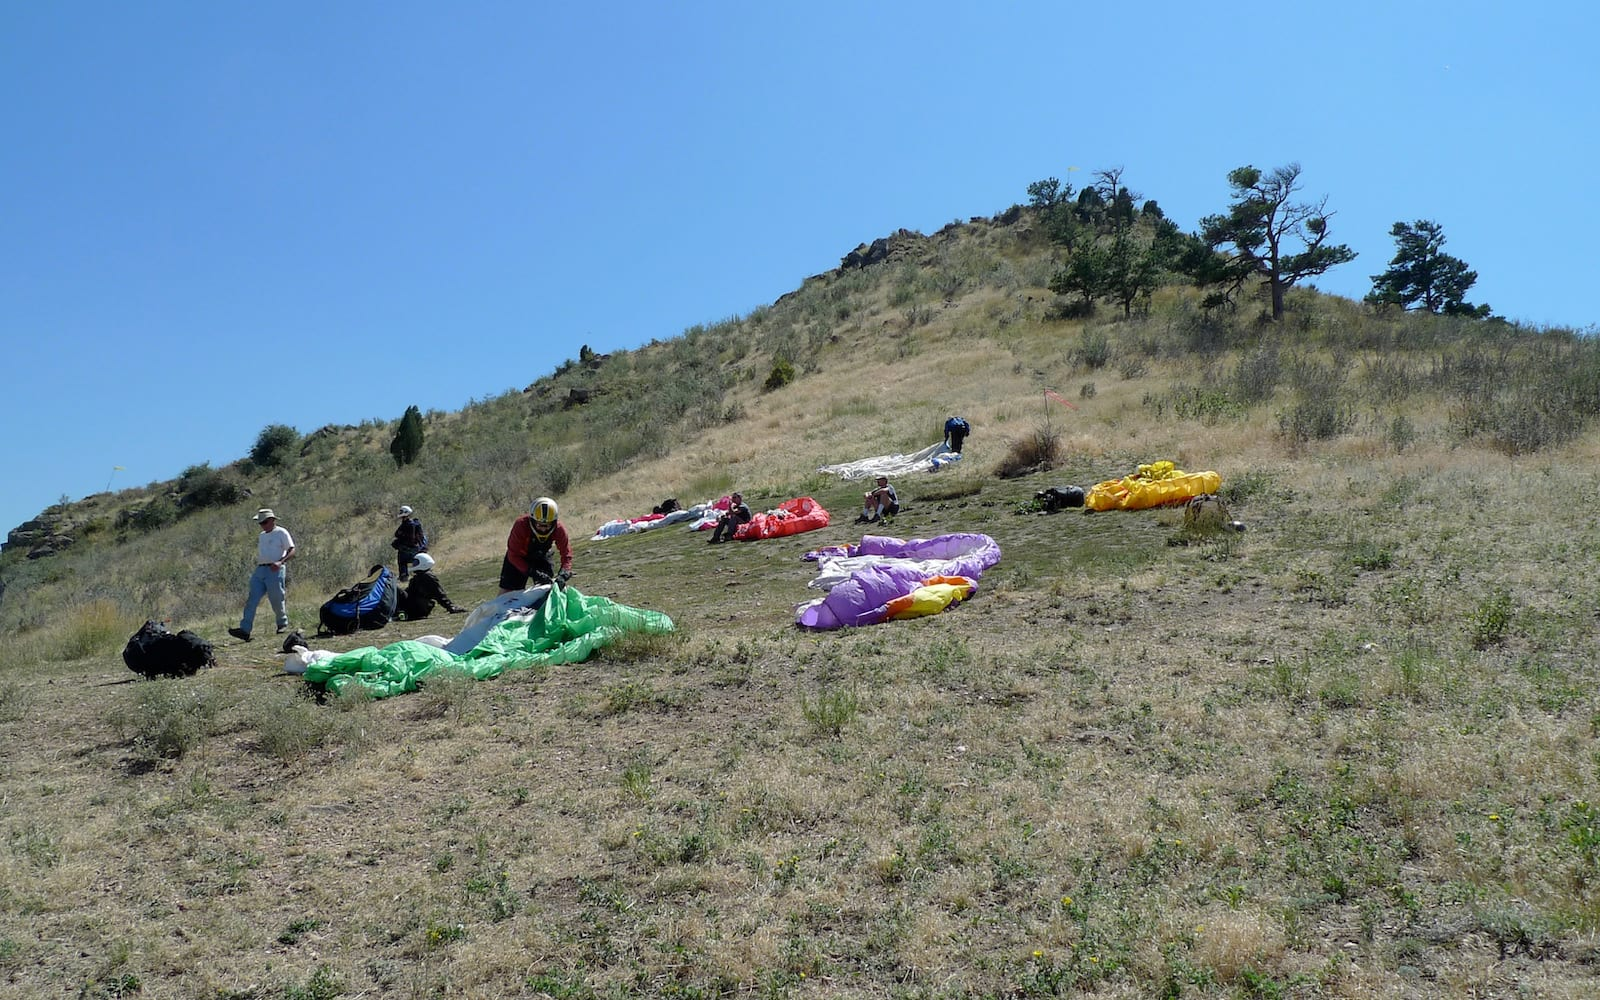 Lookout Mountain Paragliding Golden CO